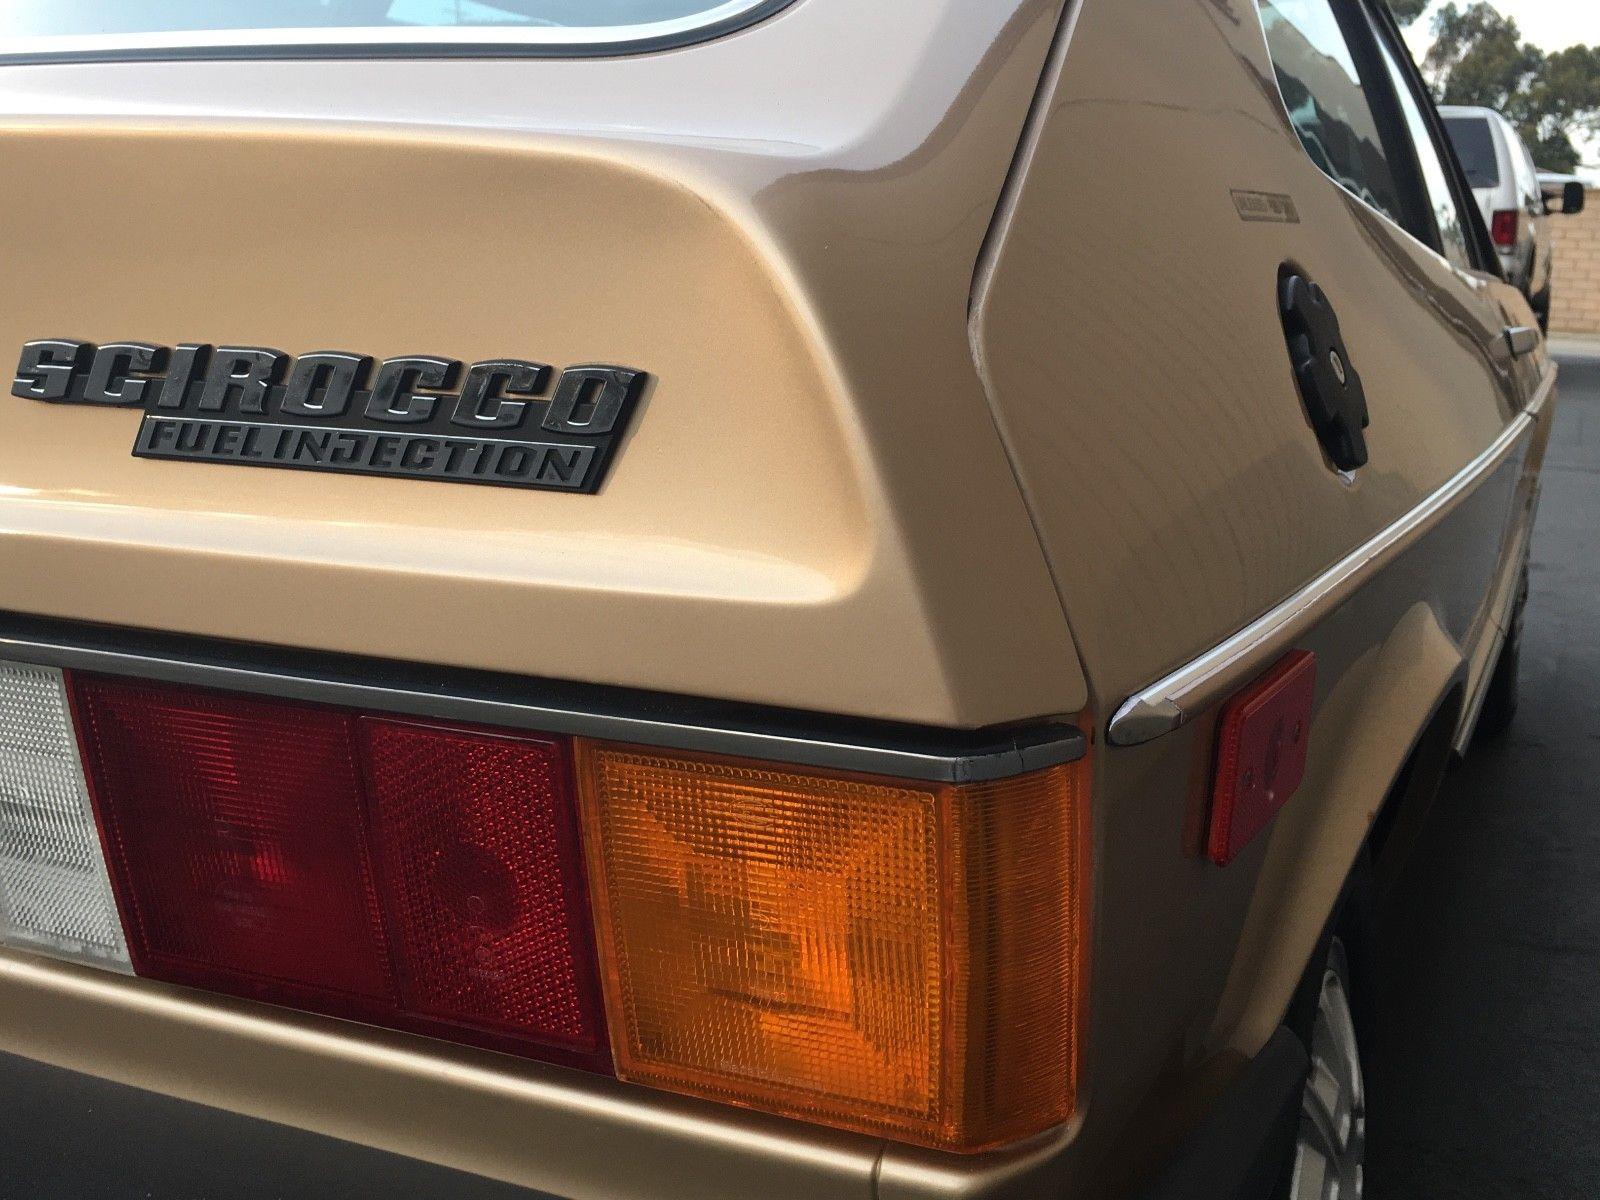 1978 Volkswagen Scirocco rear badge